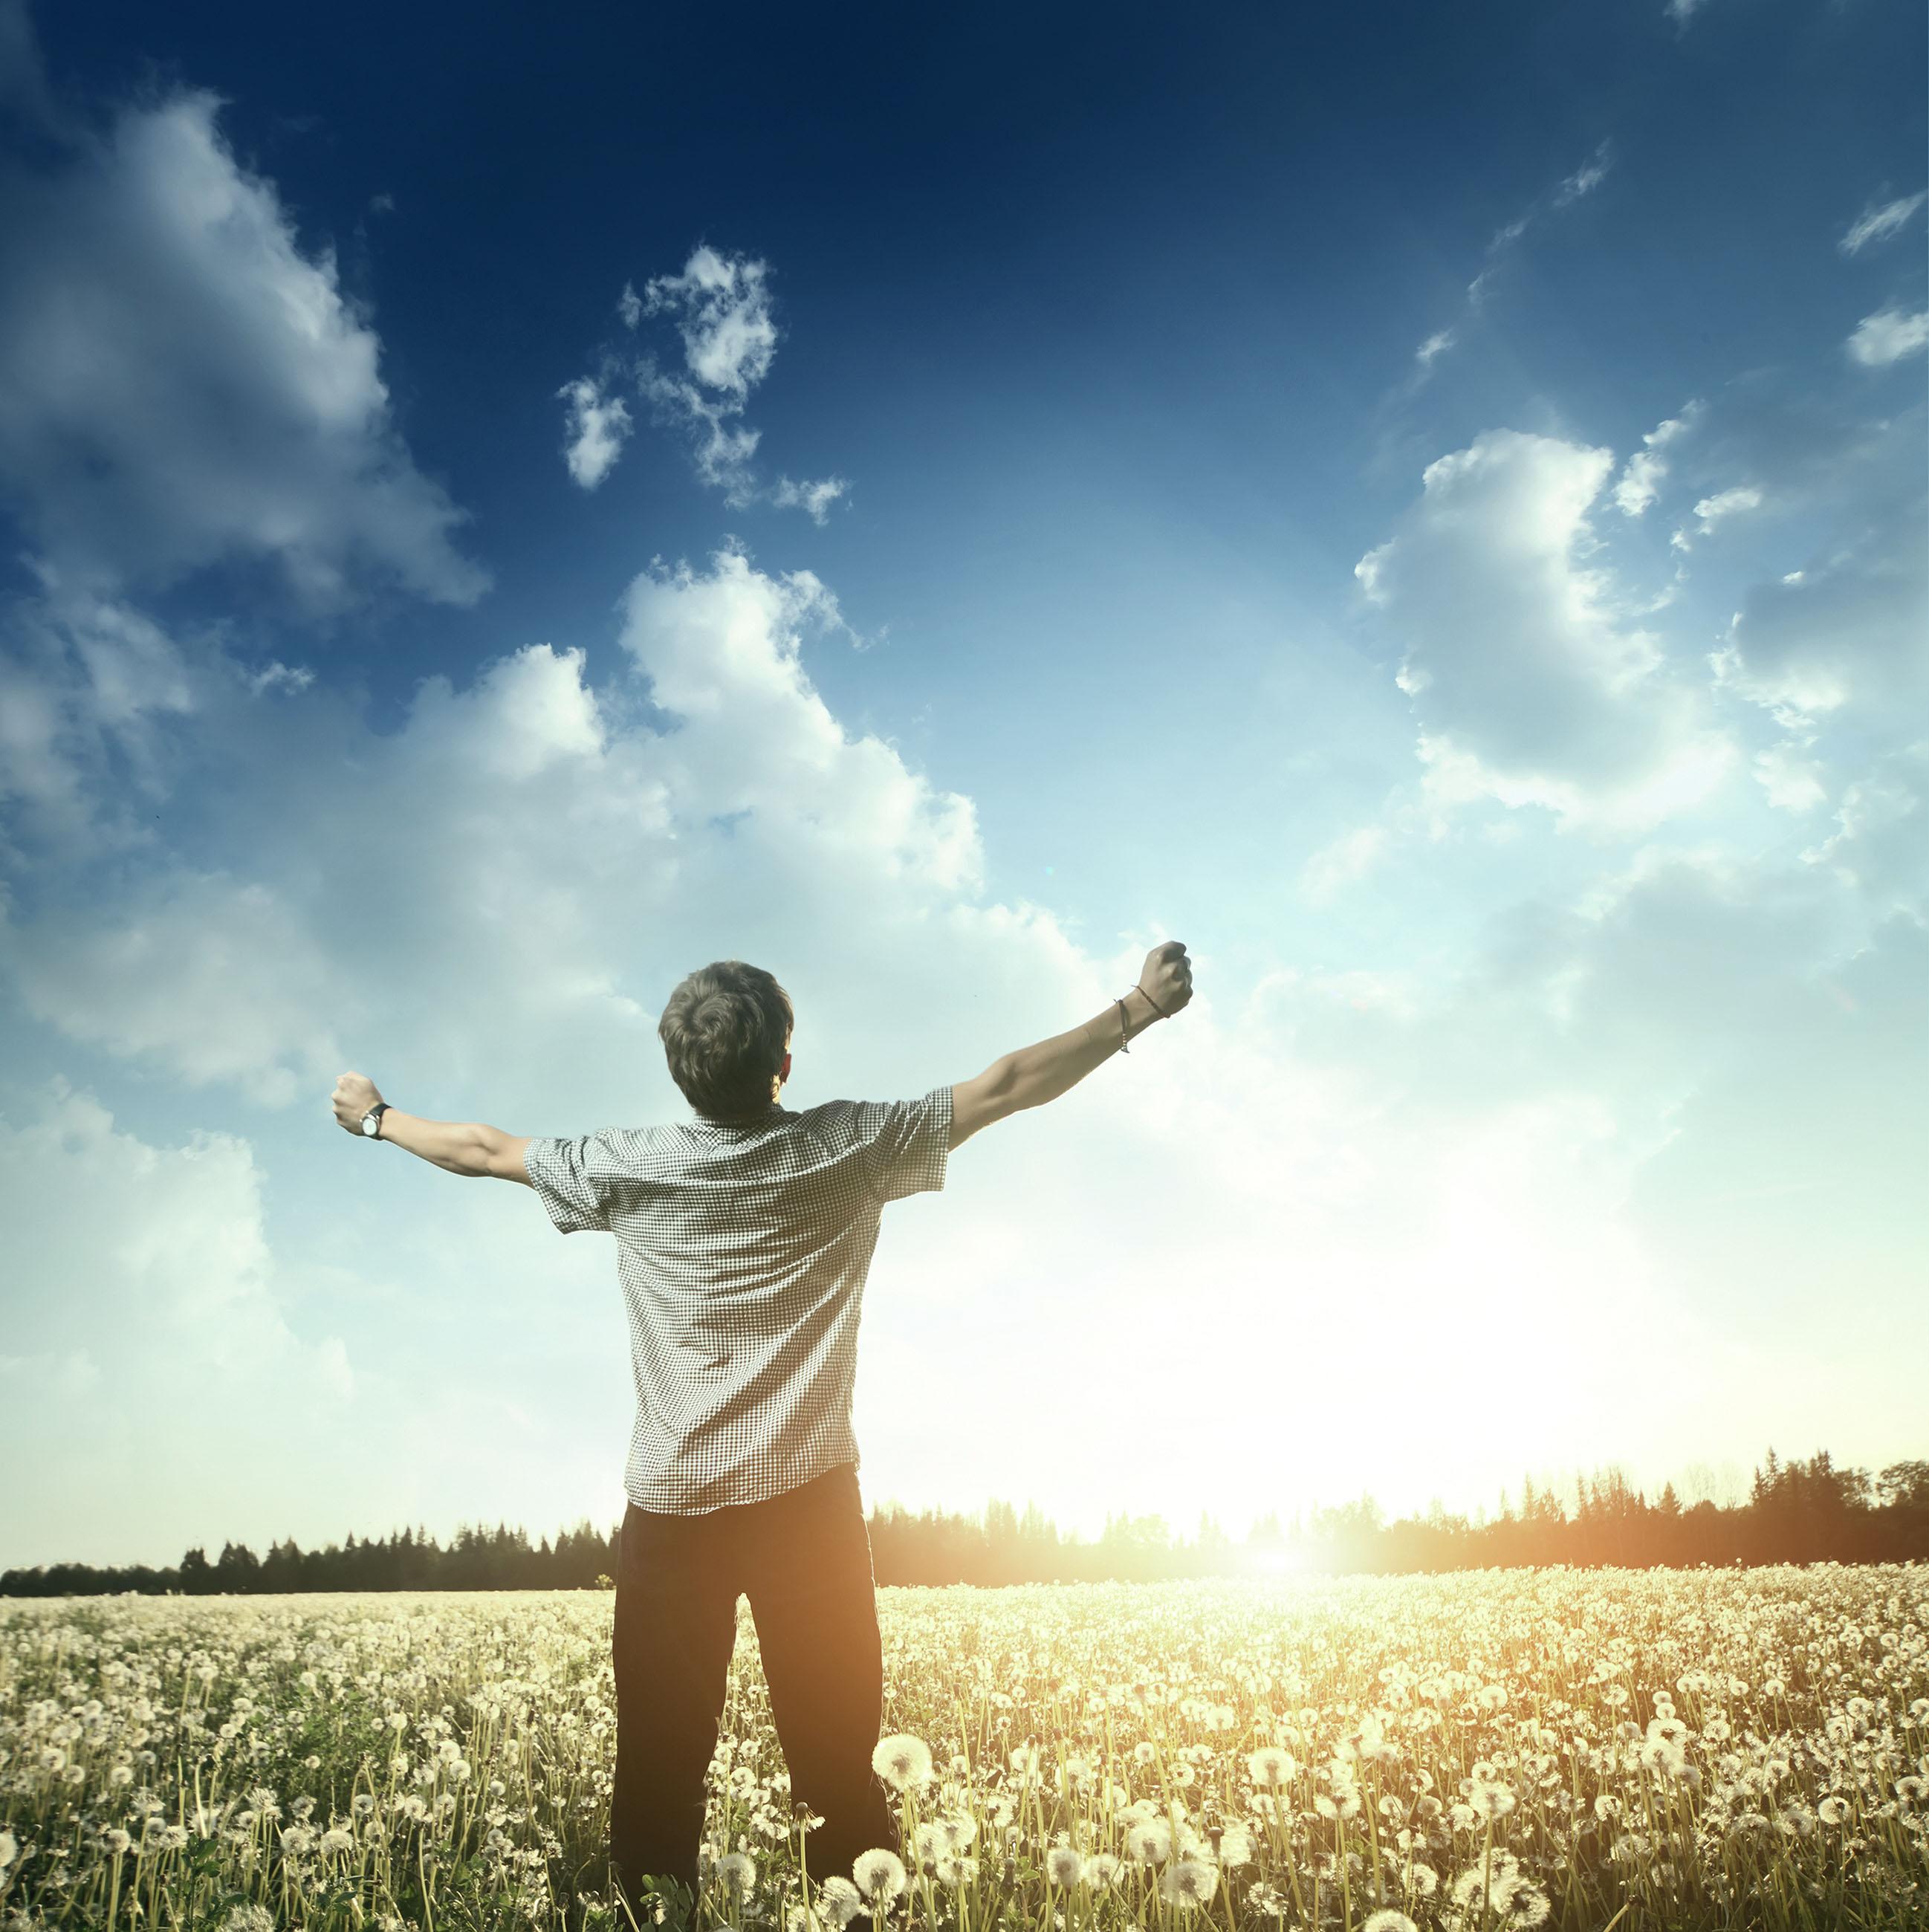 Стою подняв свои руки к небу